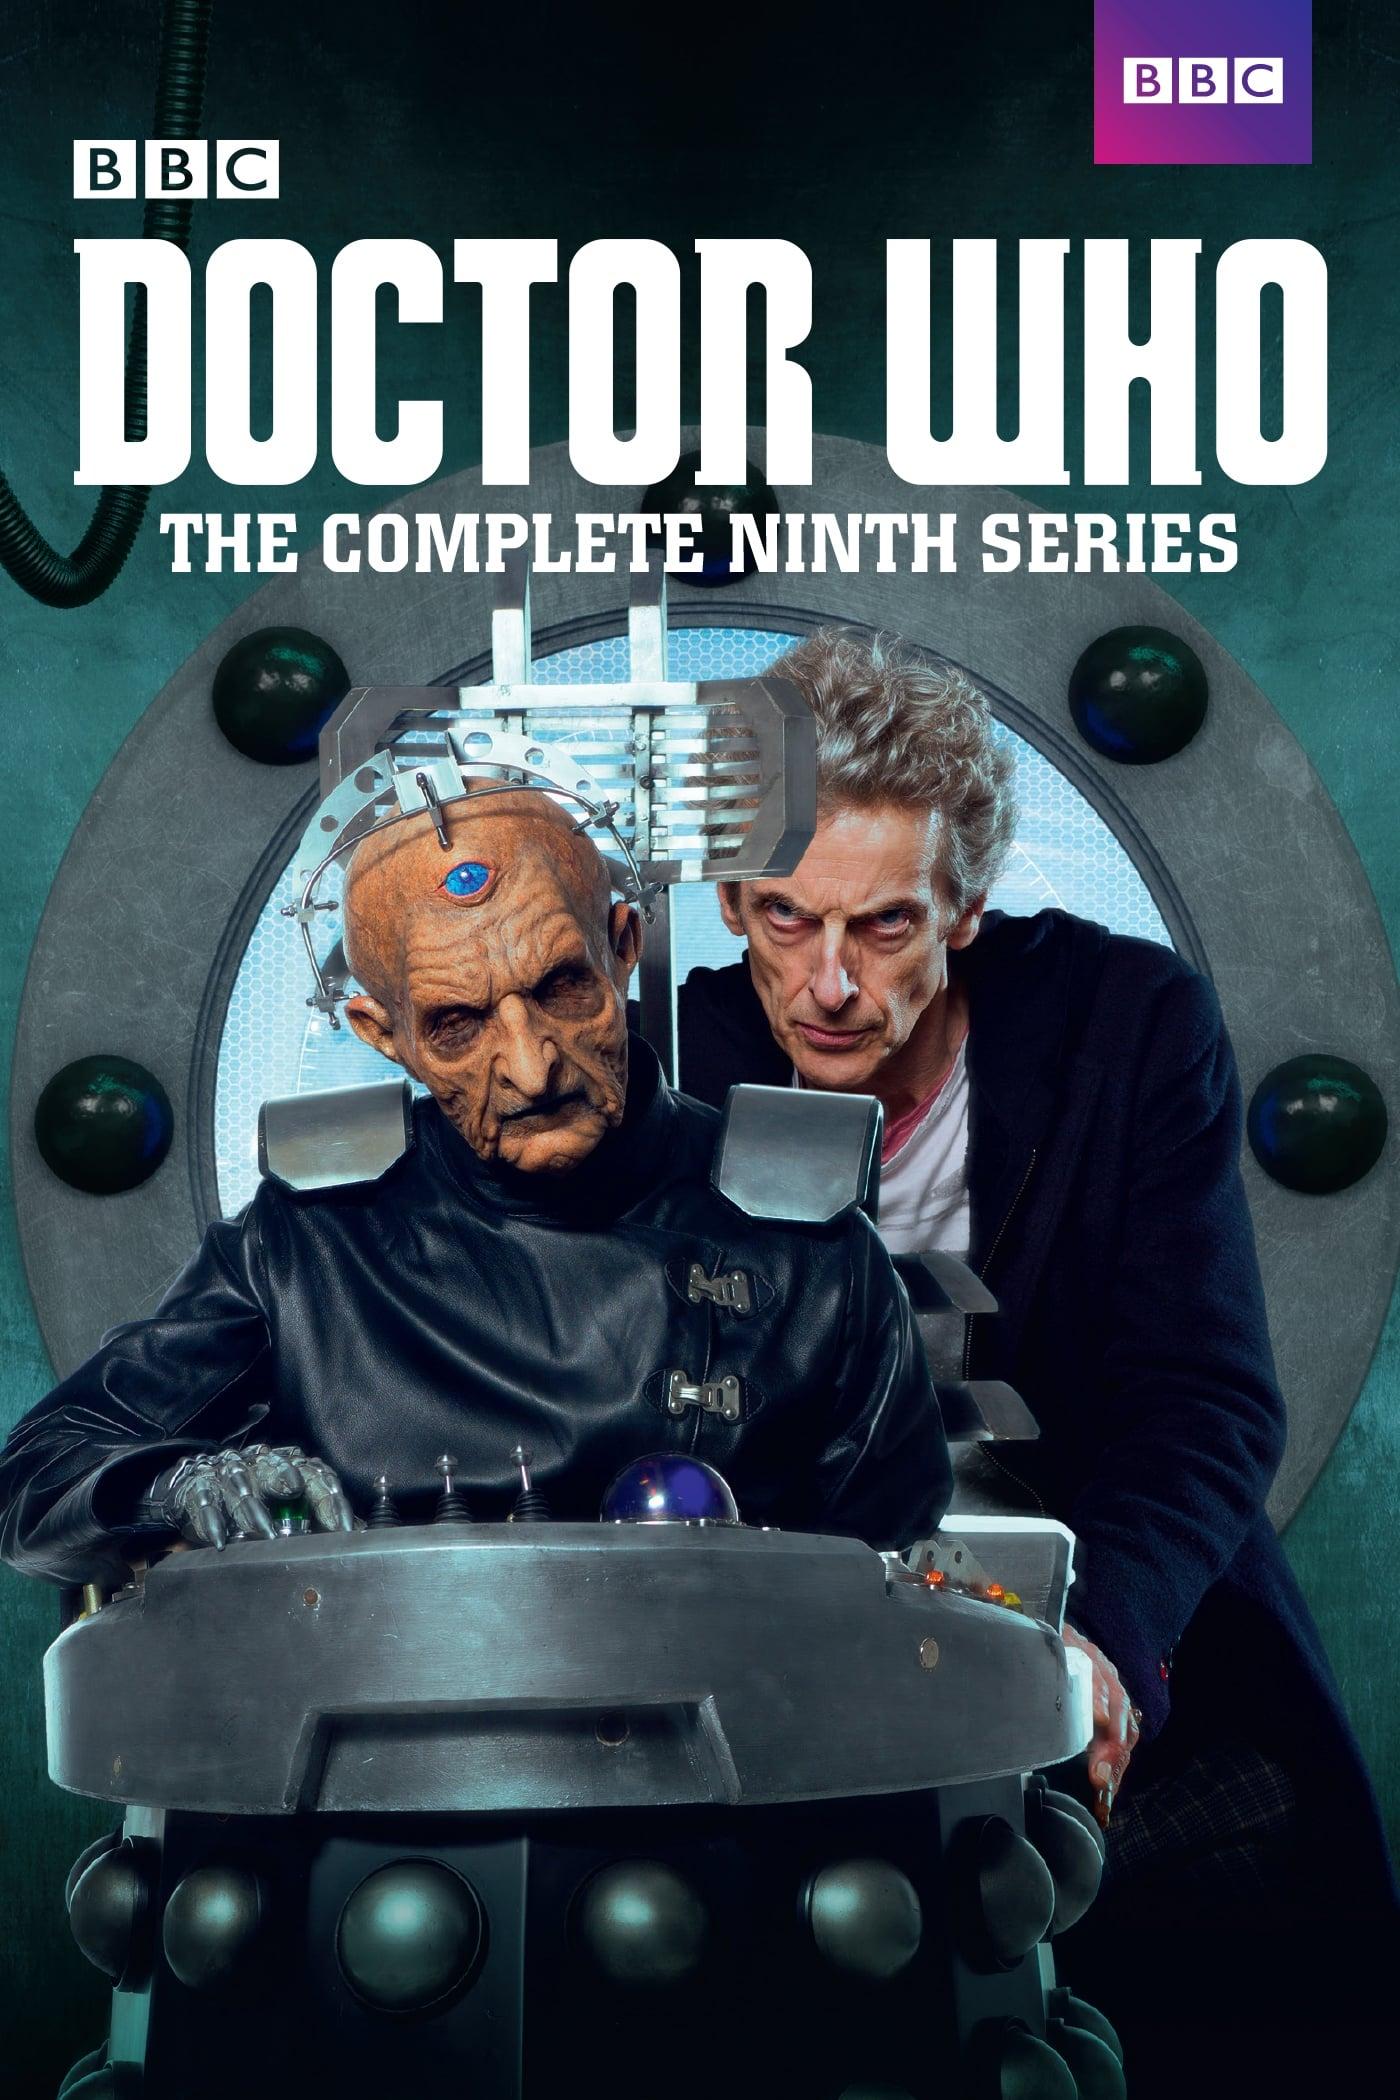 Doctor Who (TV Series 2015) Season 9